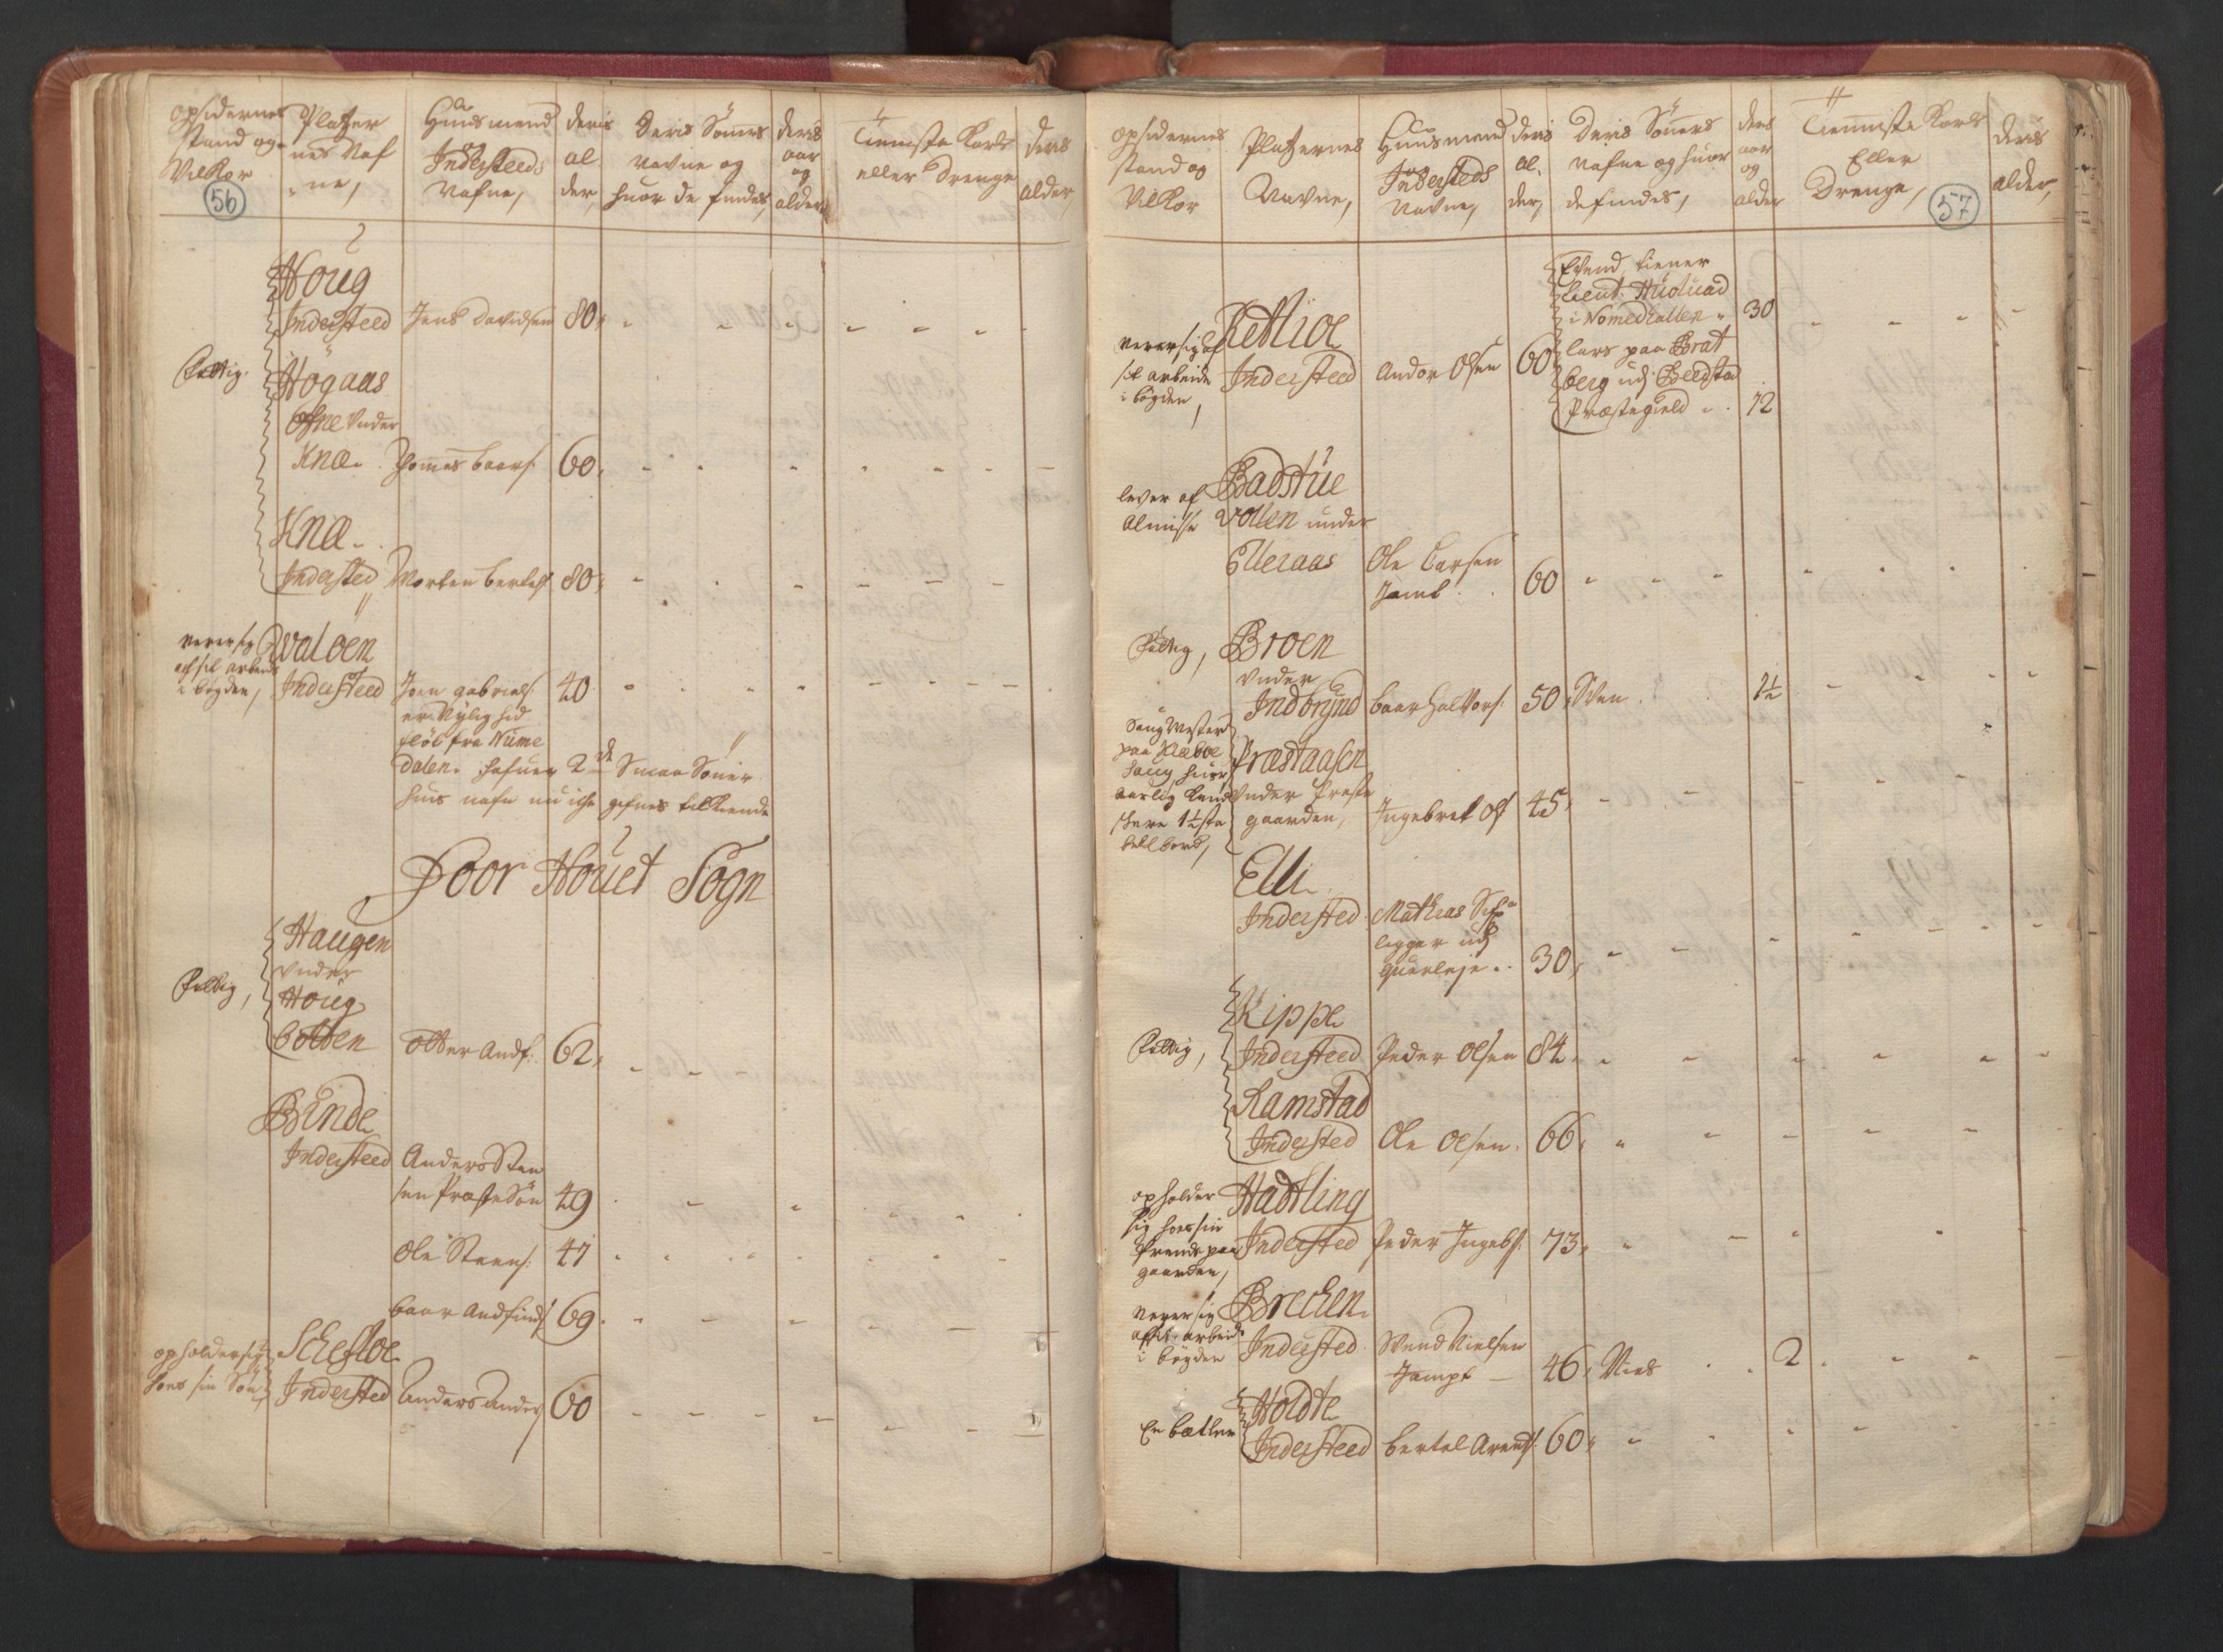 RA, Manntallet 1701, nr. 15: Inderøy fogderi og Namdal fogderi, 1701, s. 56-57